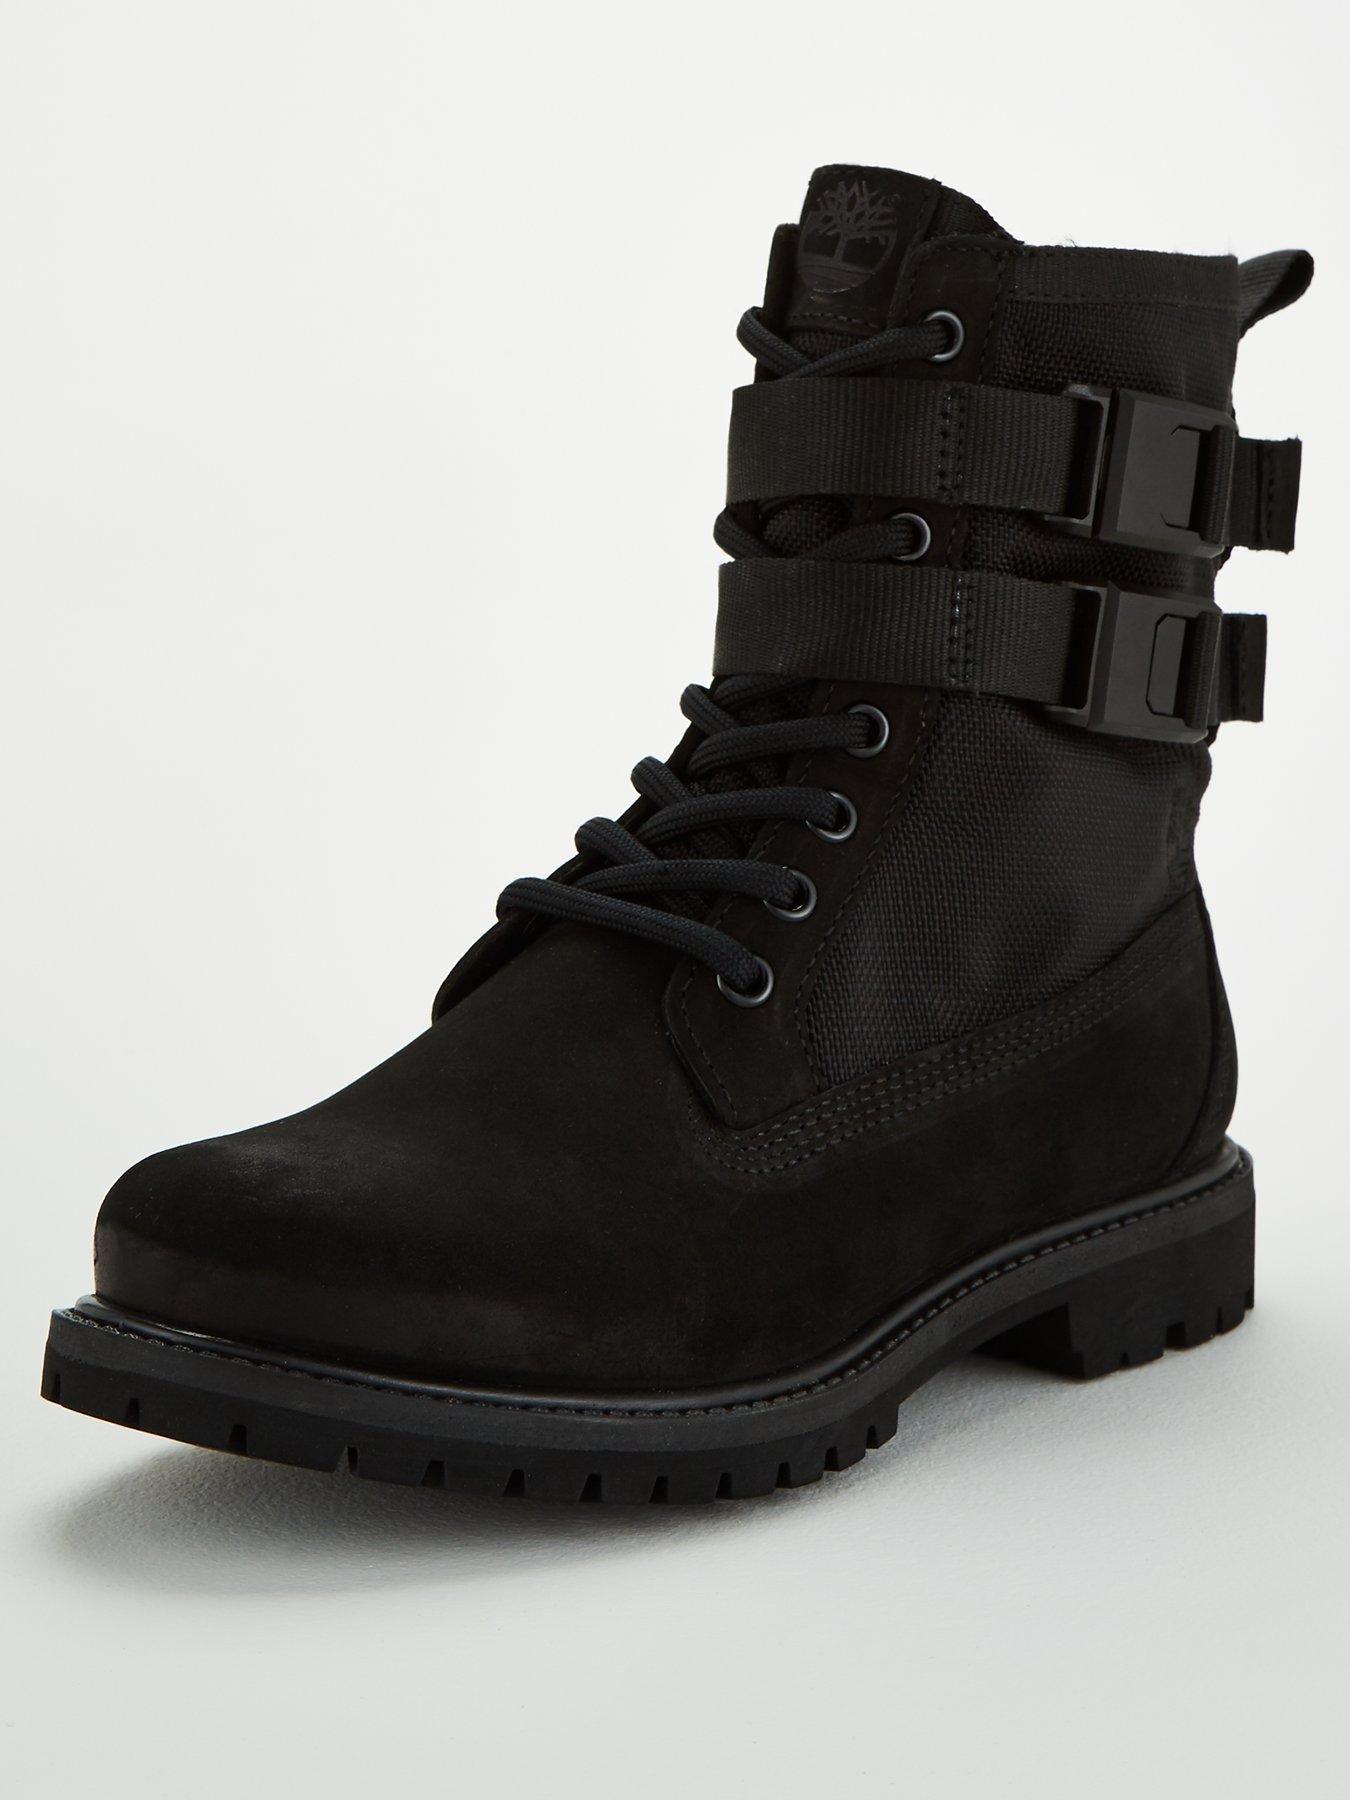 Authentics Buckle Calf Boots Black Kalvesko, svart  Calf boots, Black